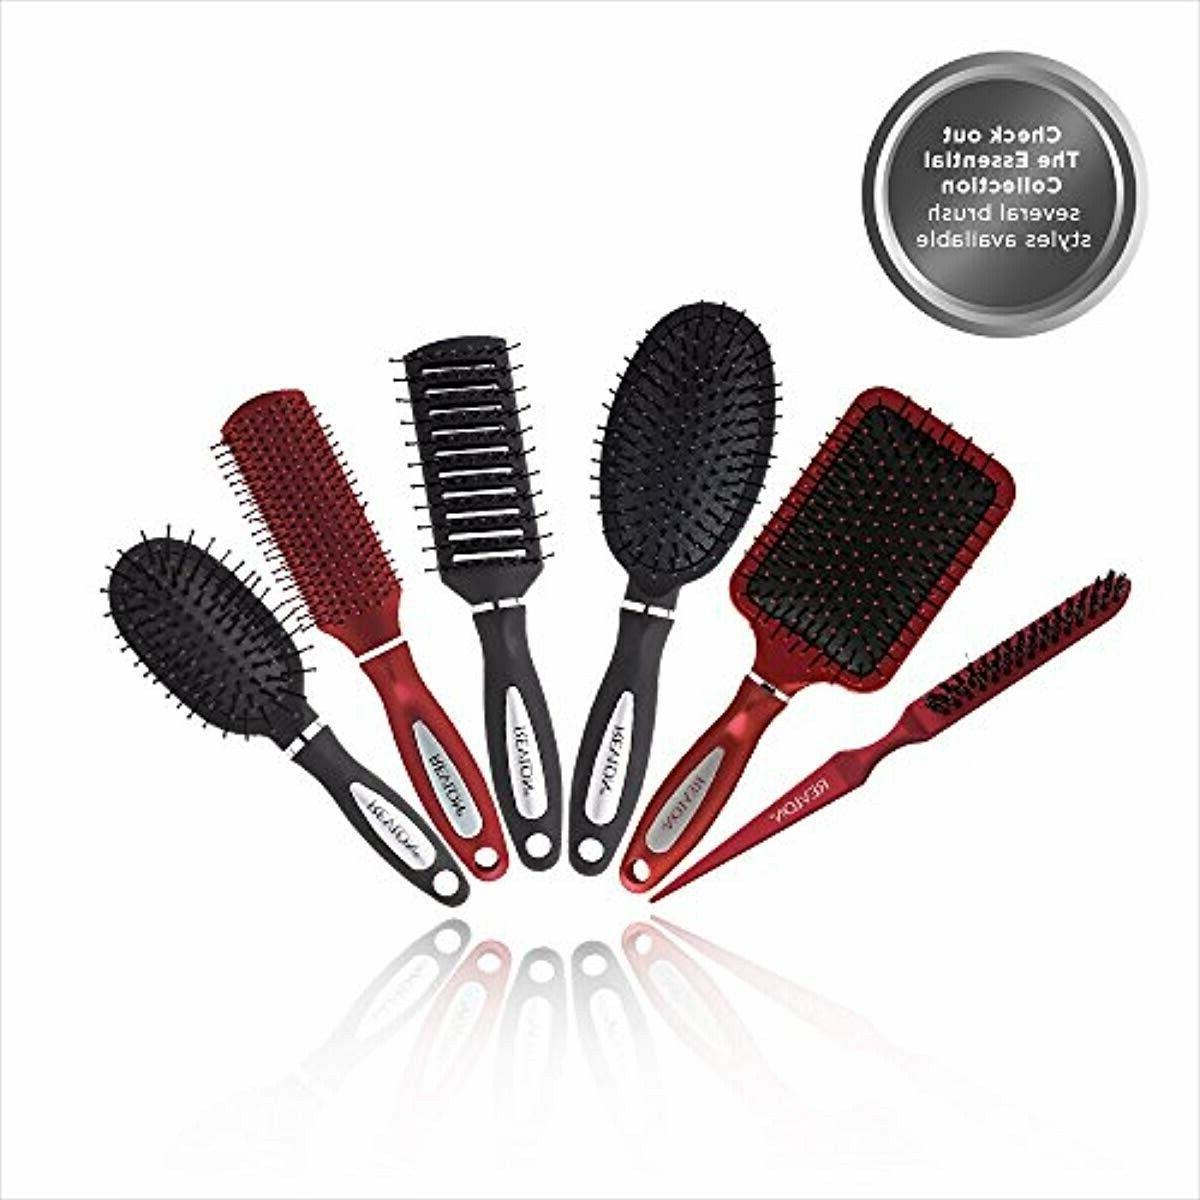 Revlon Finish All Purpose Hair Brush